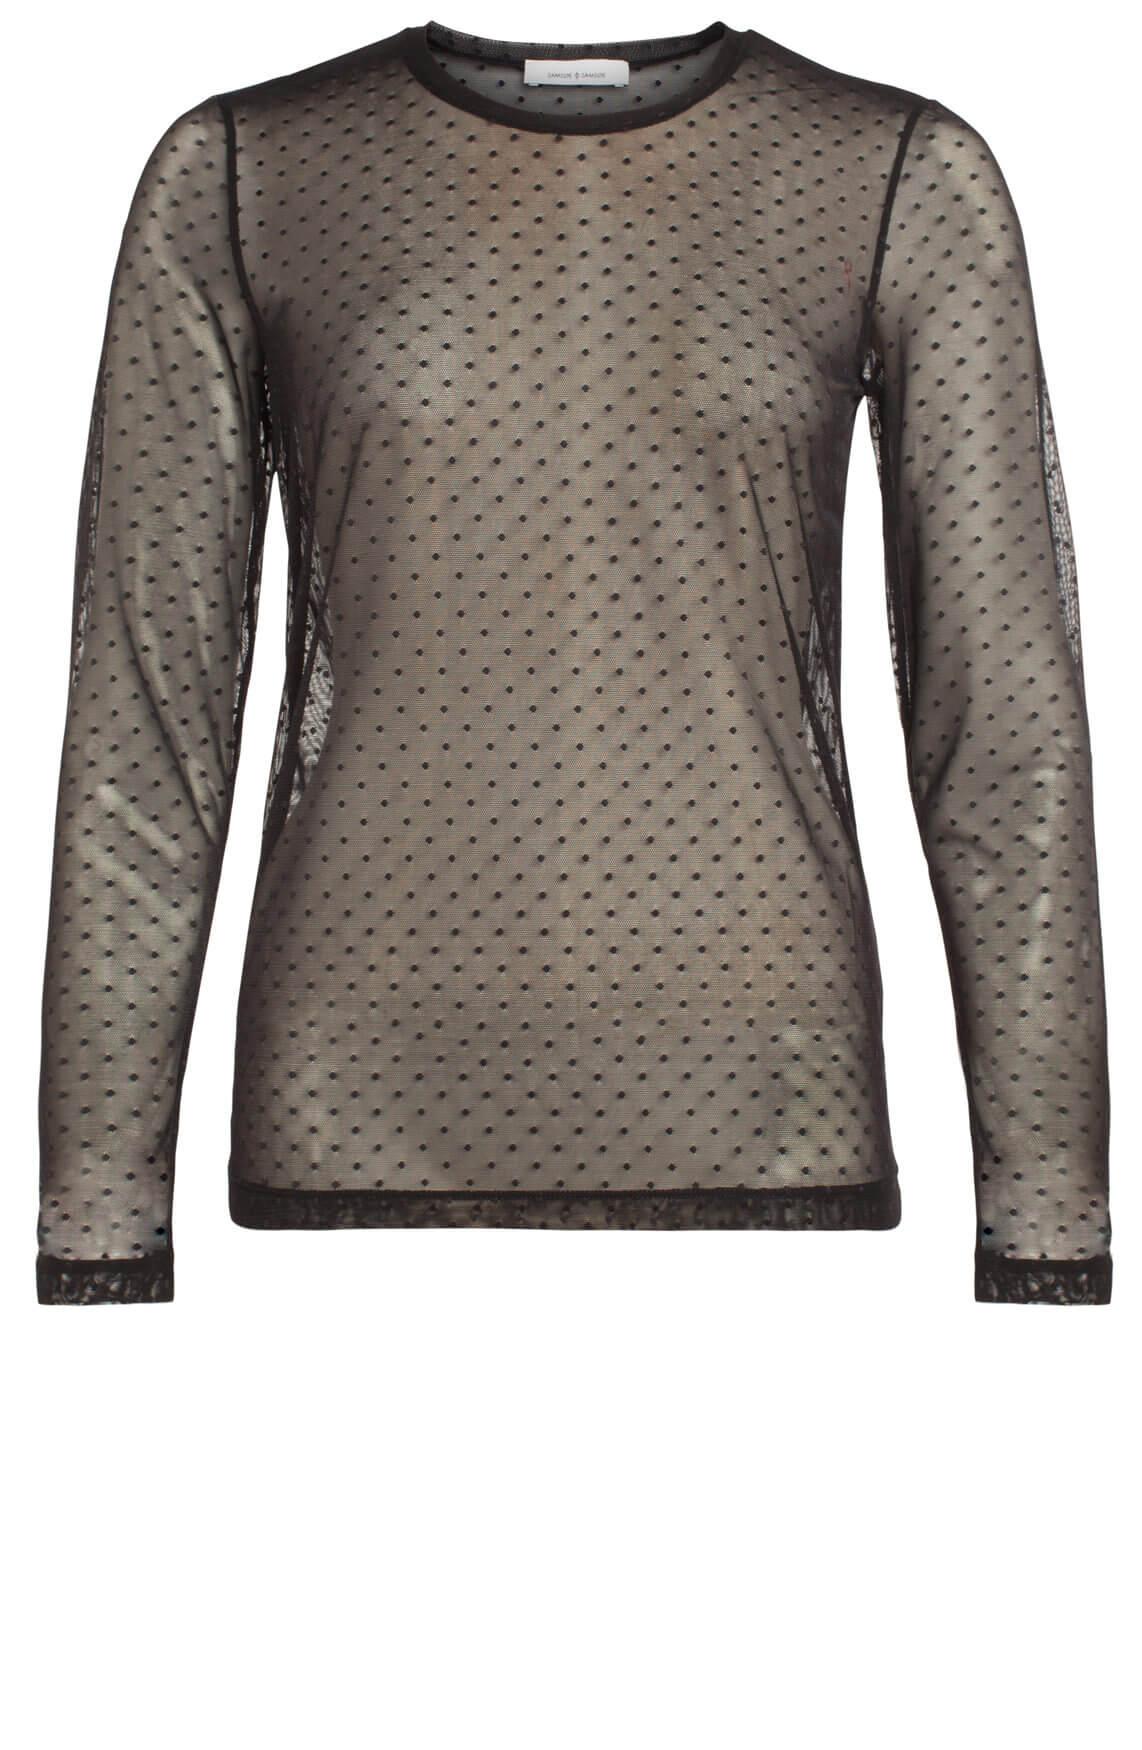 Samsoe Samsoe Dames Tracy transparant shirt zwart